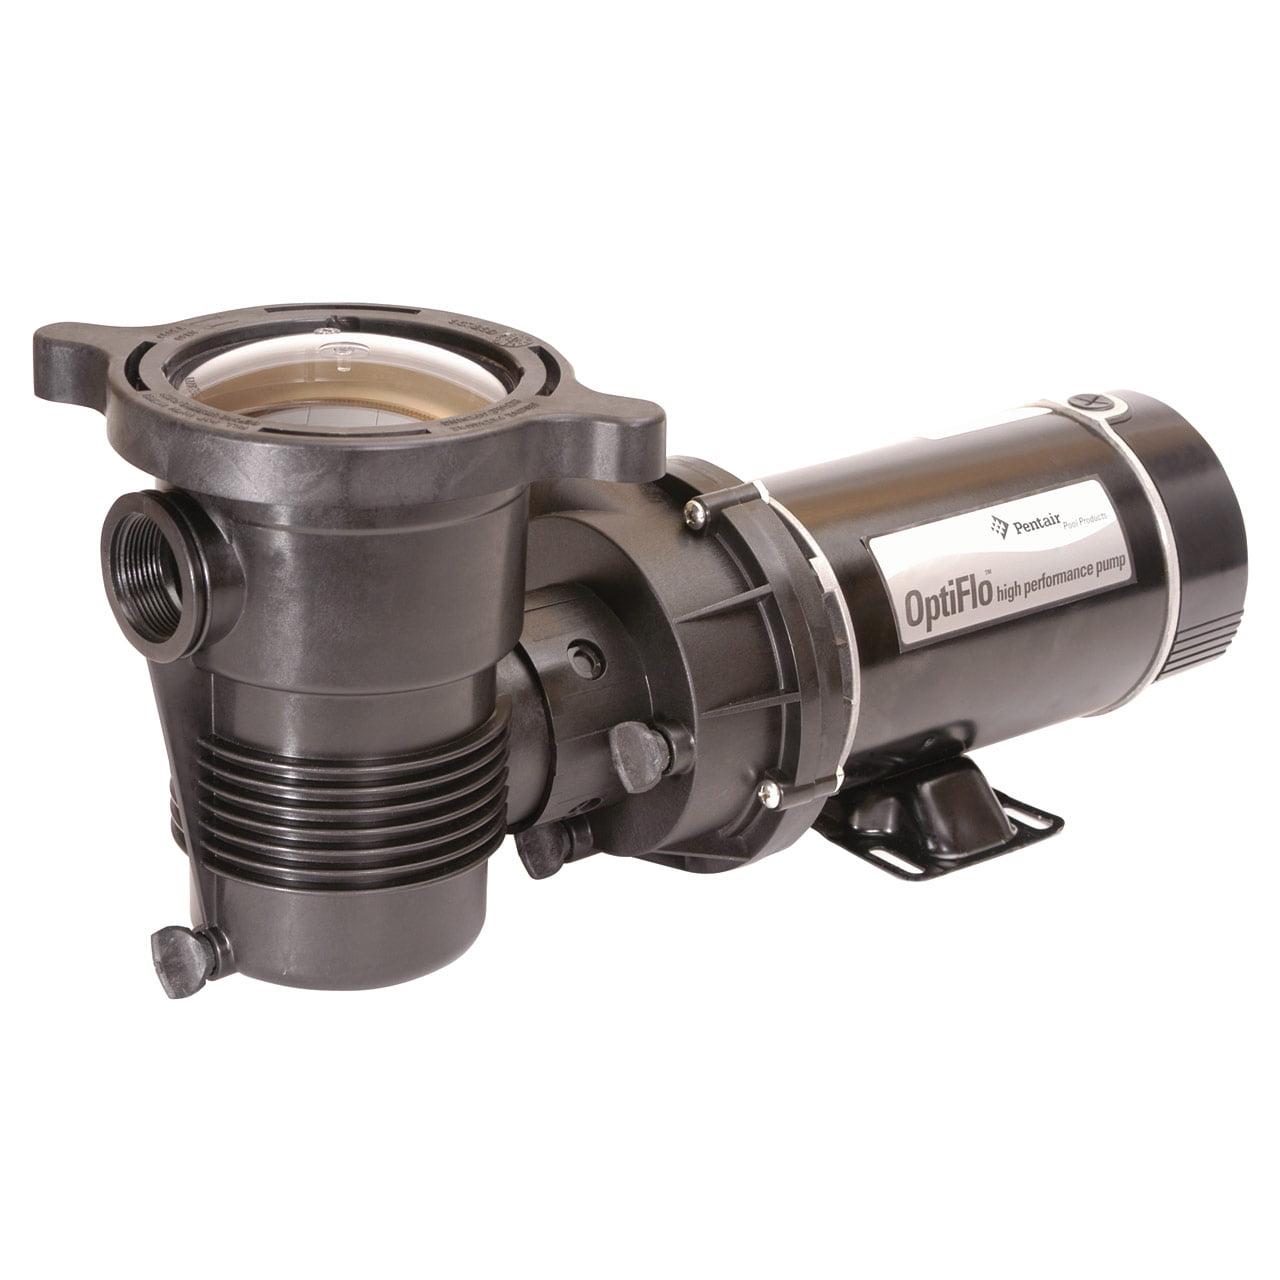 Pentair OptiFlo 1 HP Above-Ground Pool Pump